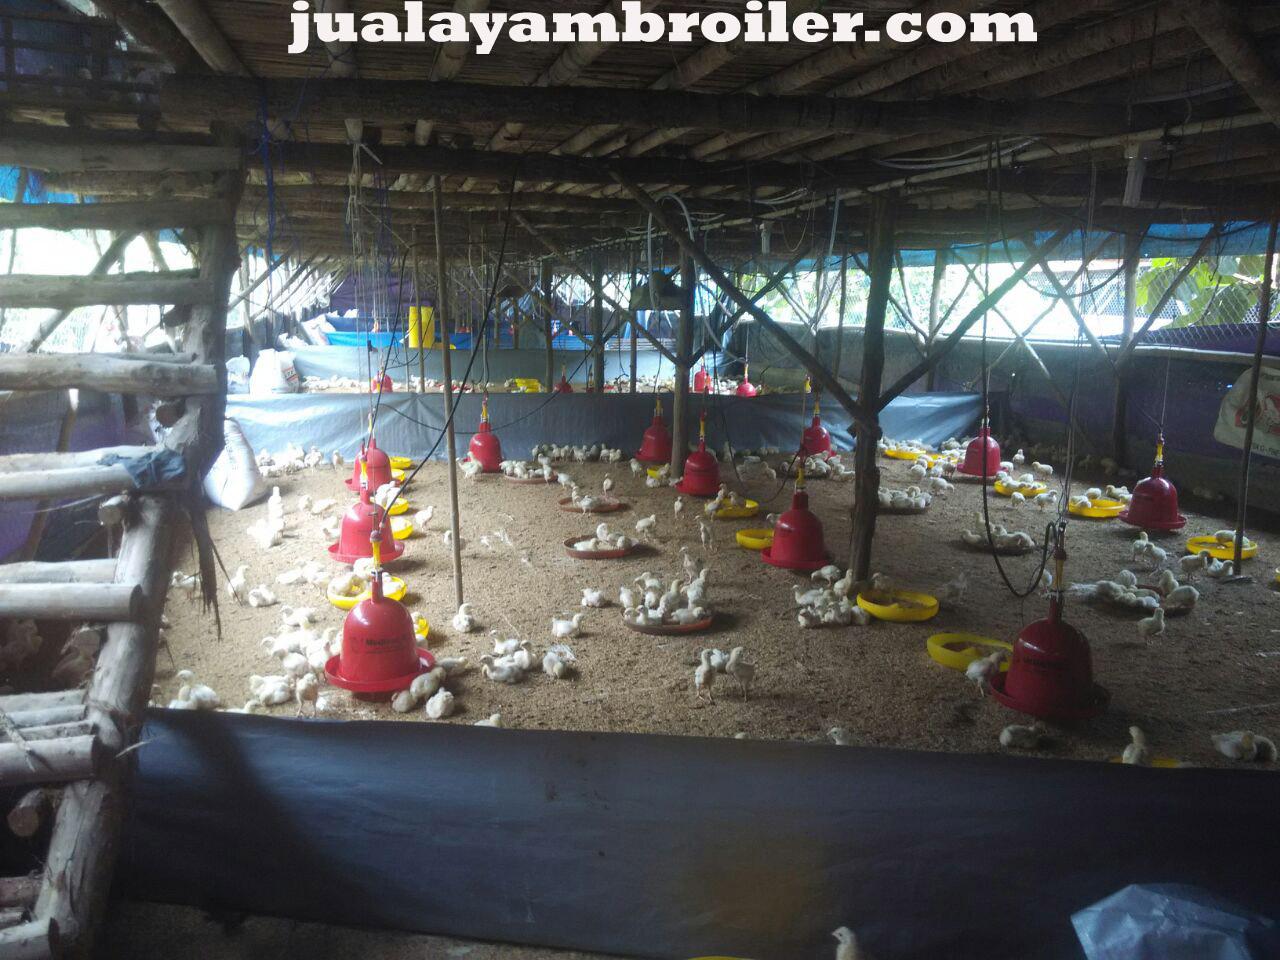 Jual Ayam Broiler di Pinang Ranti Jakarta Timur